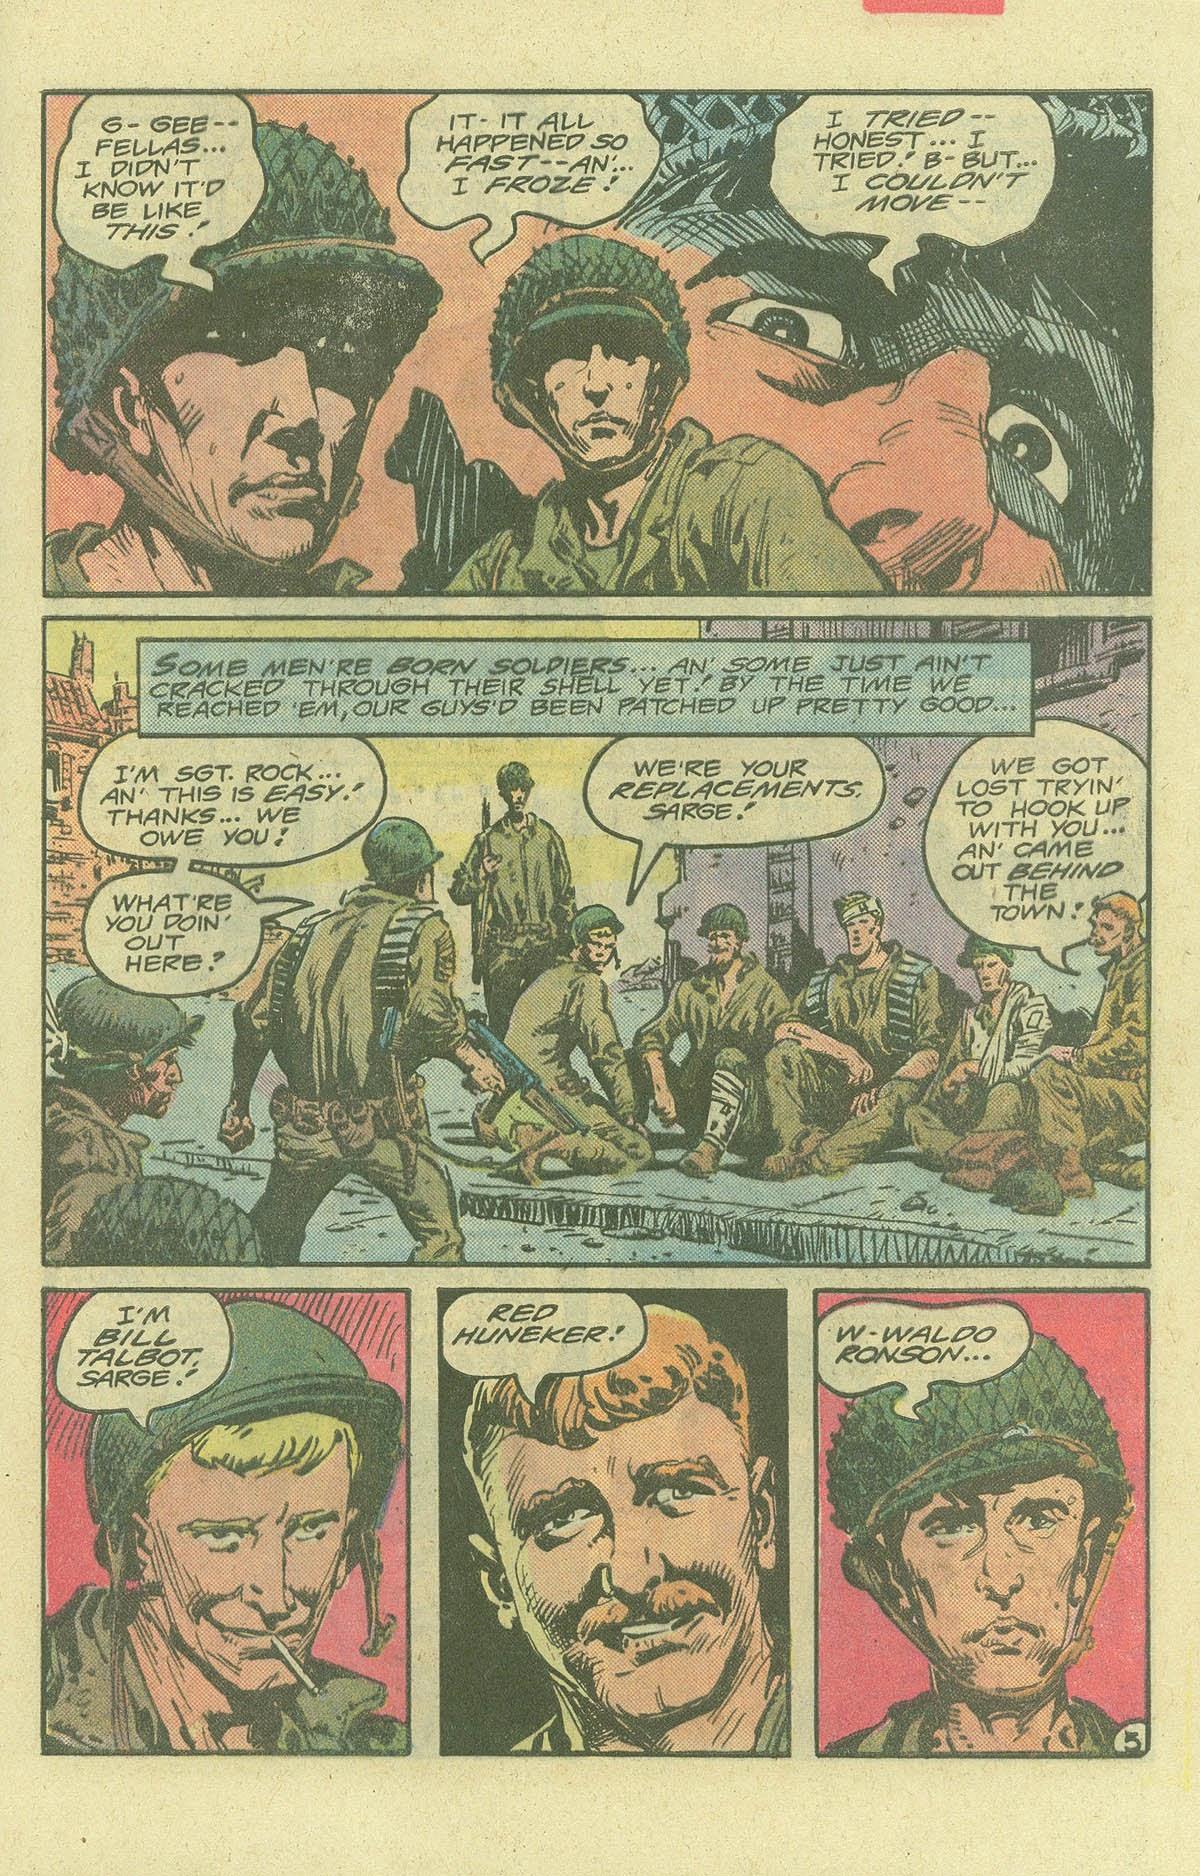 Read online Sgt. Rock comic -  Issue #380 - 8